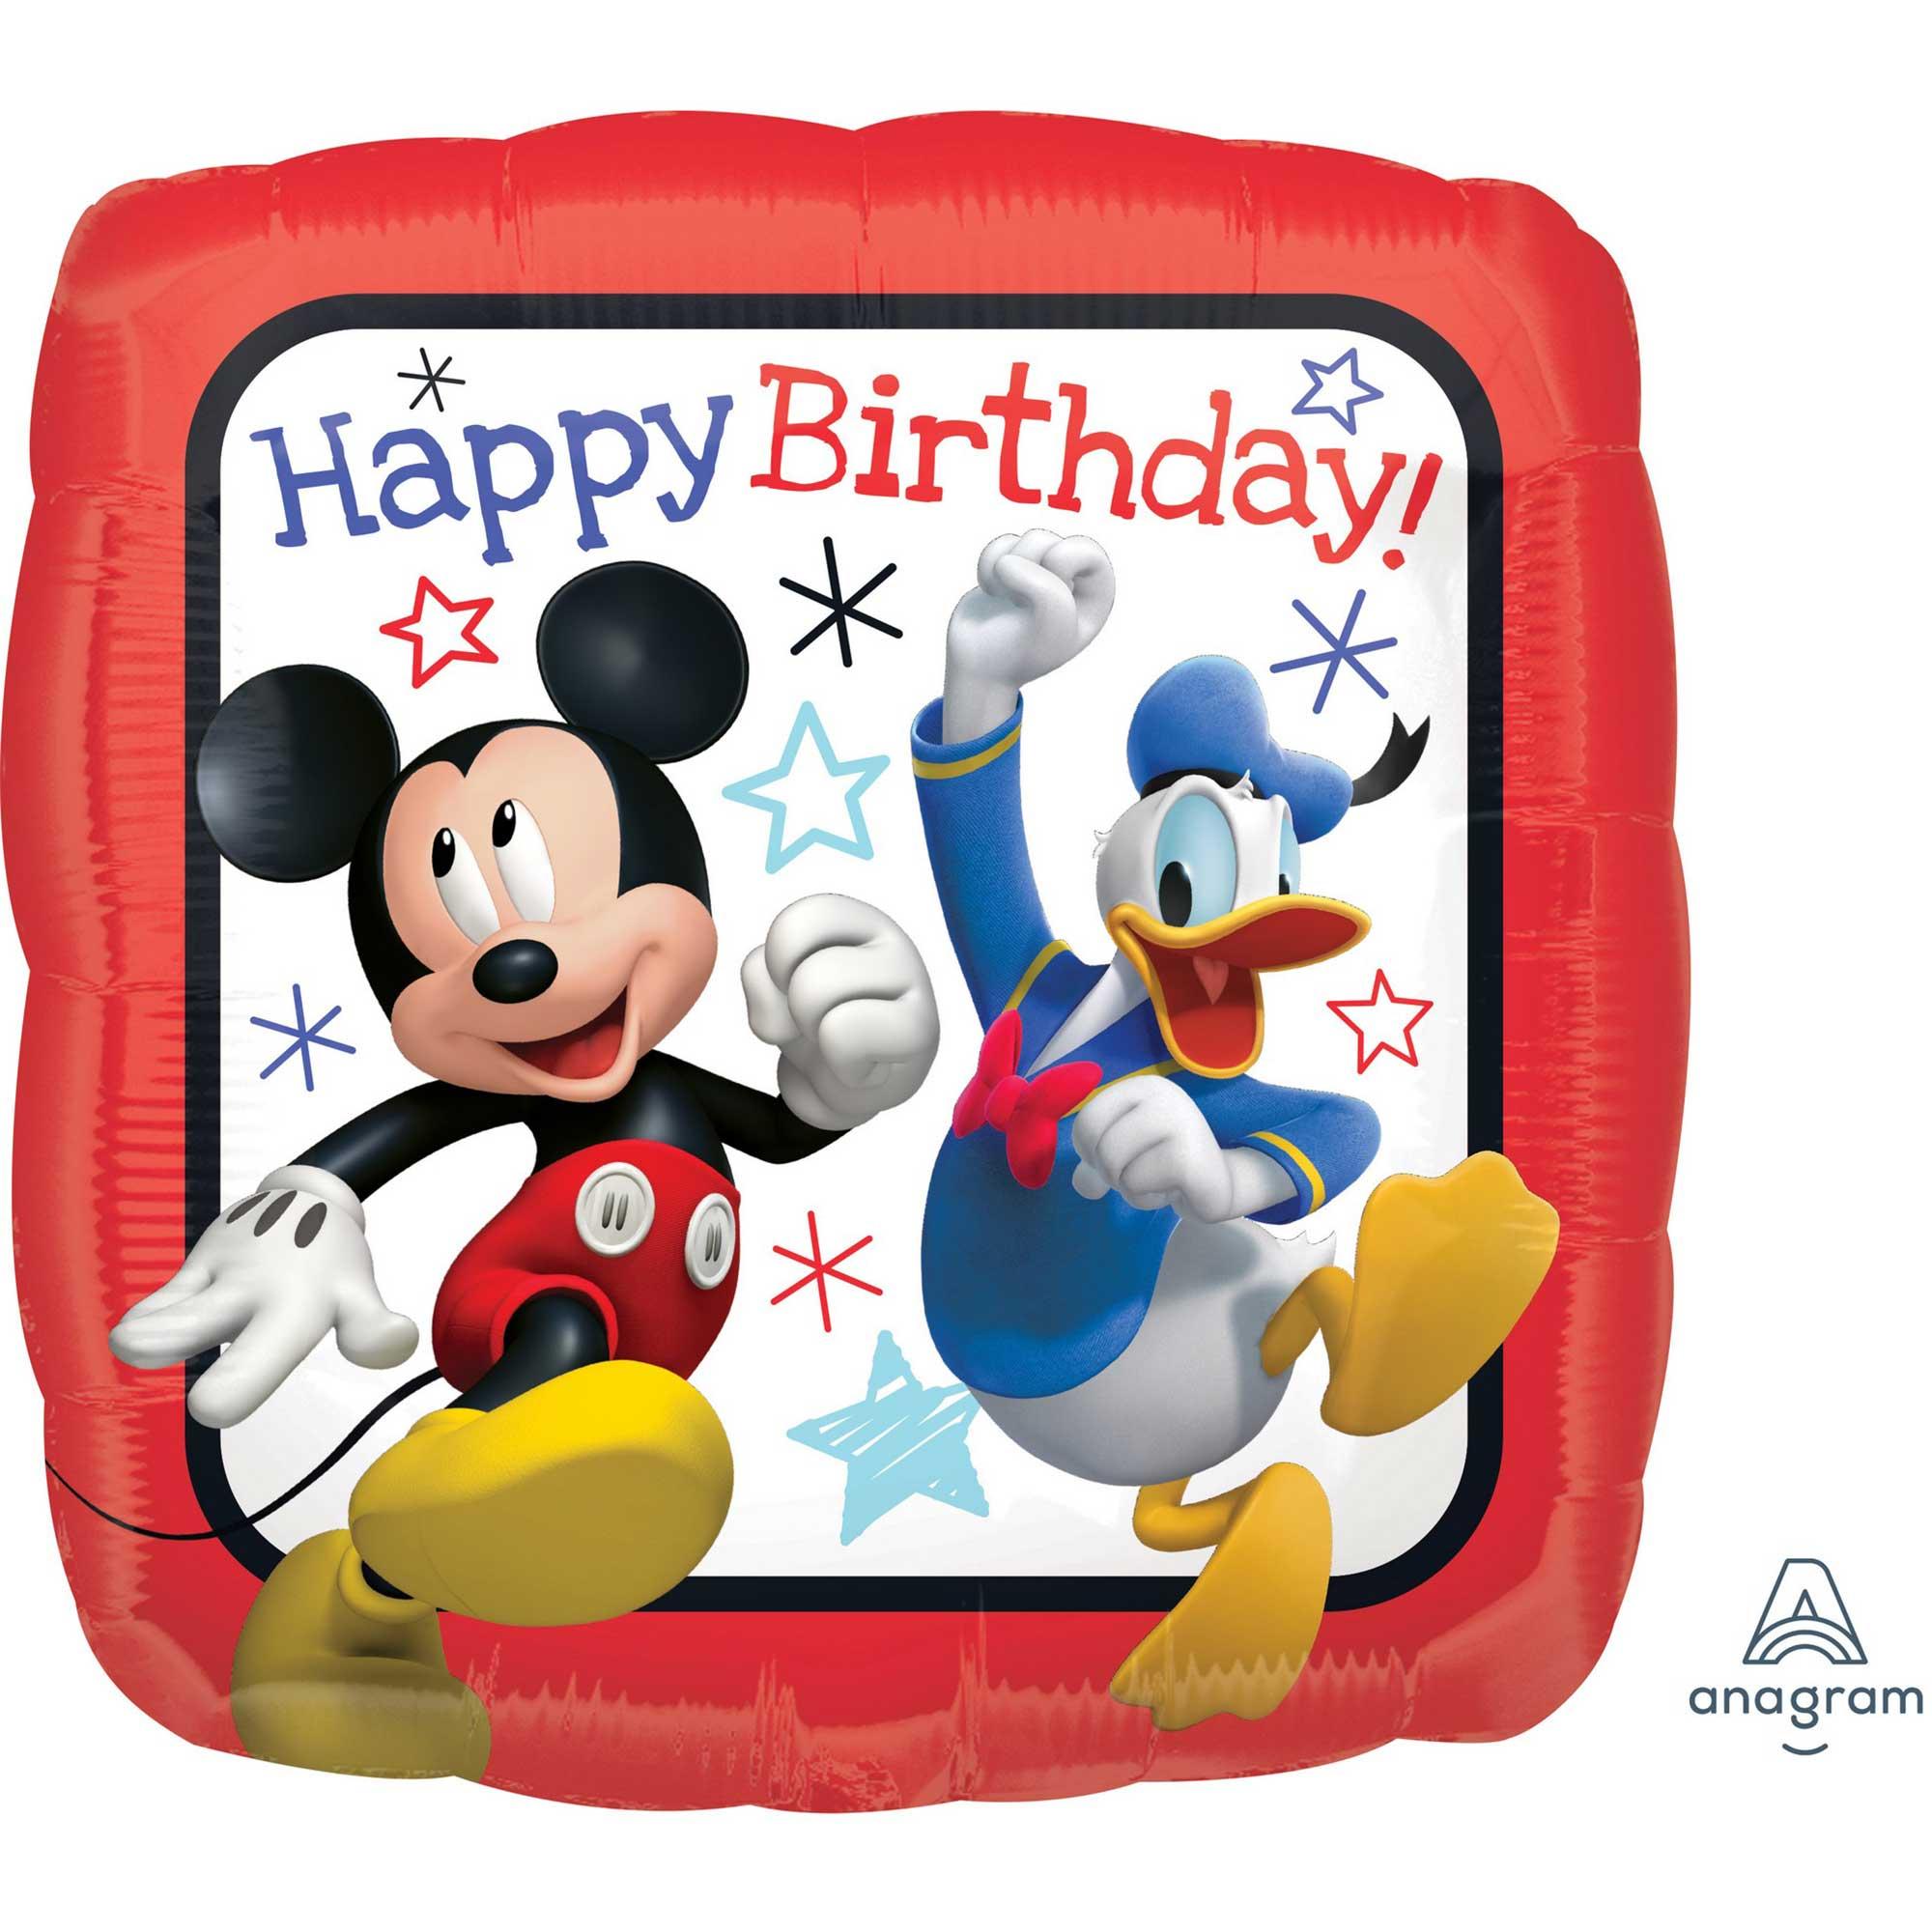 45cm Standard HX Mickey Roadster Racers Happy Birthday S60